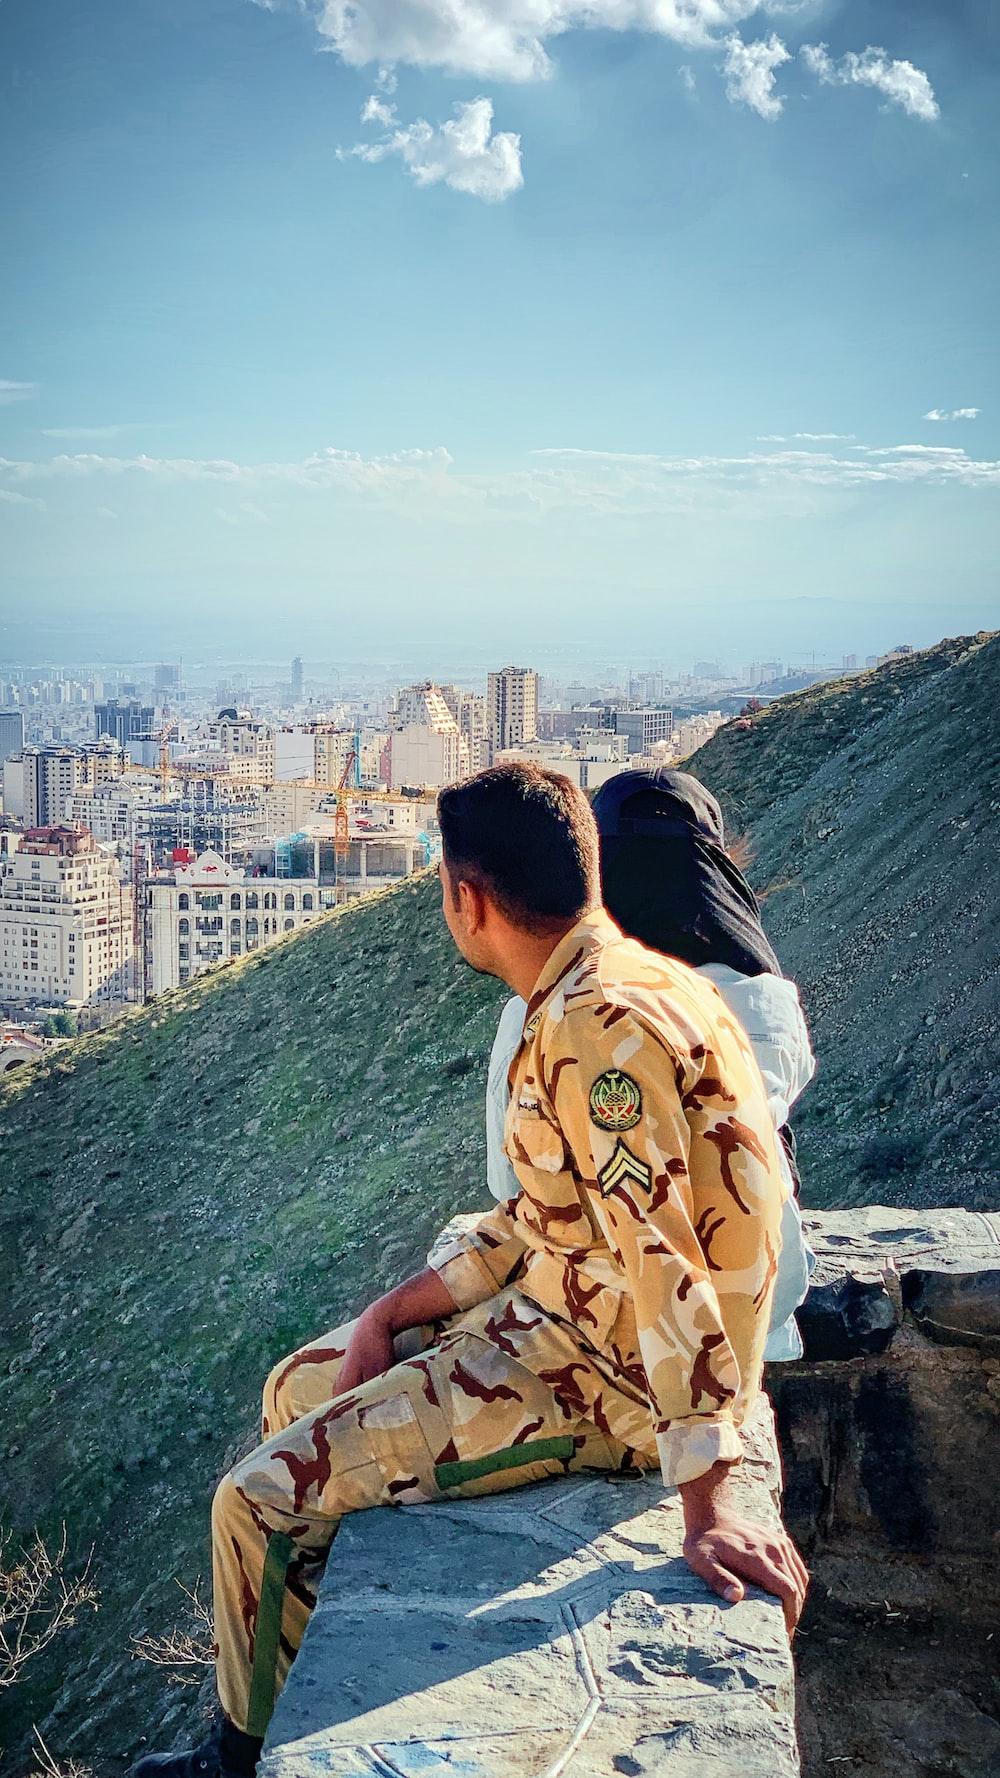 man and woman sitting near hill